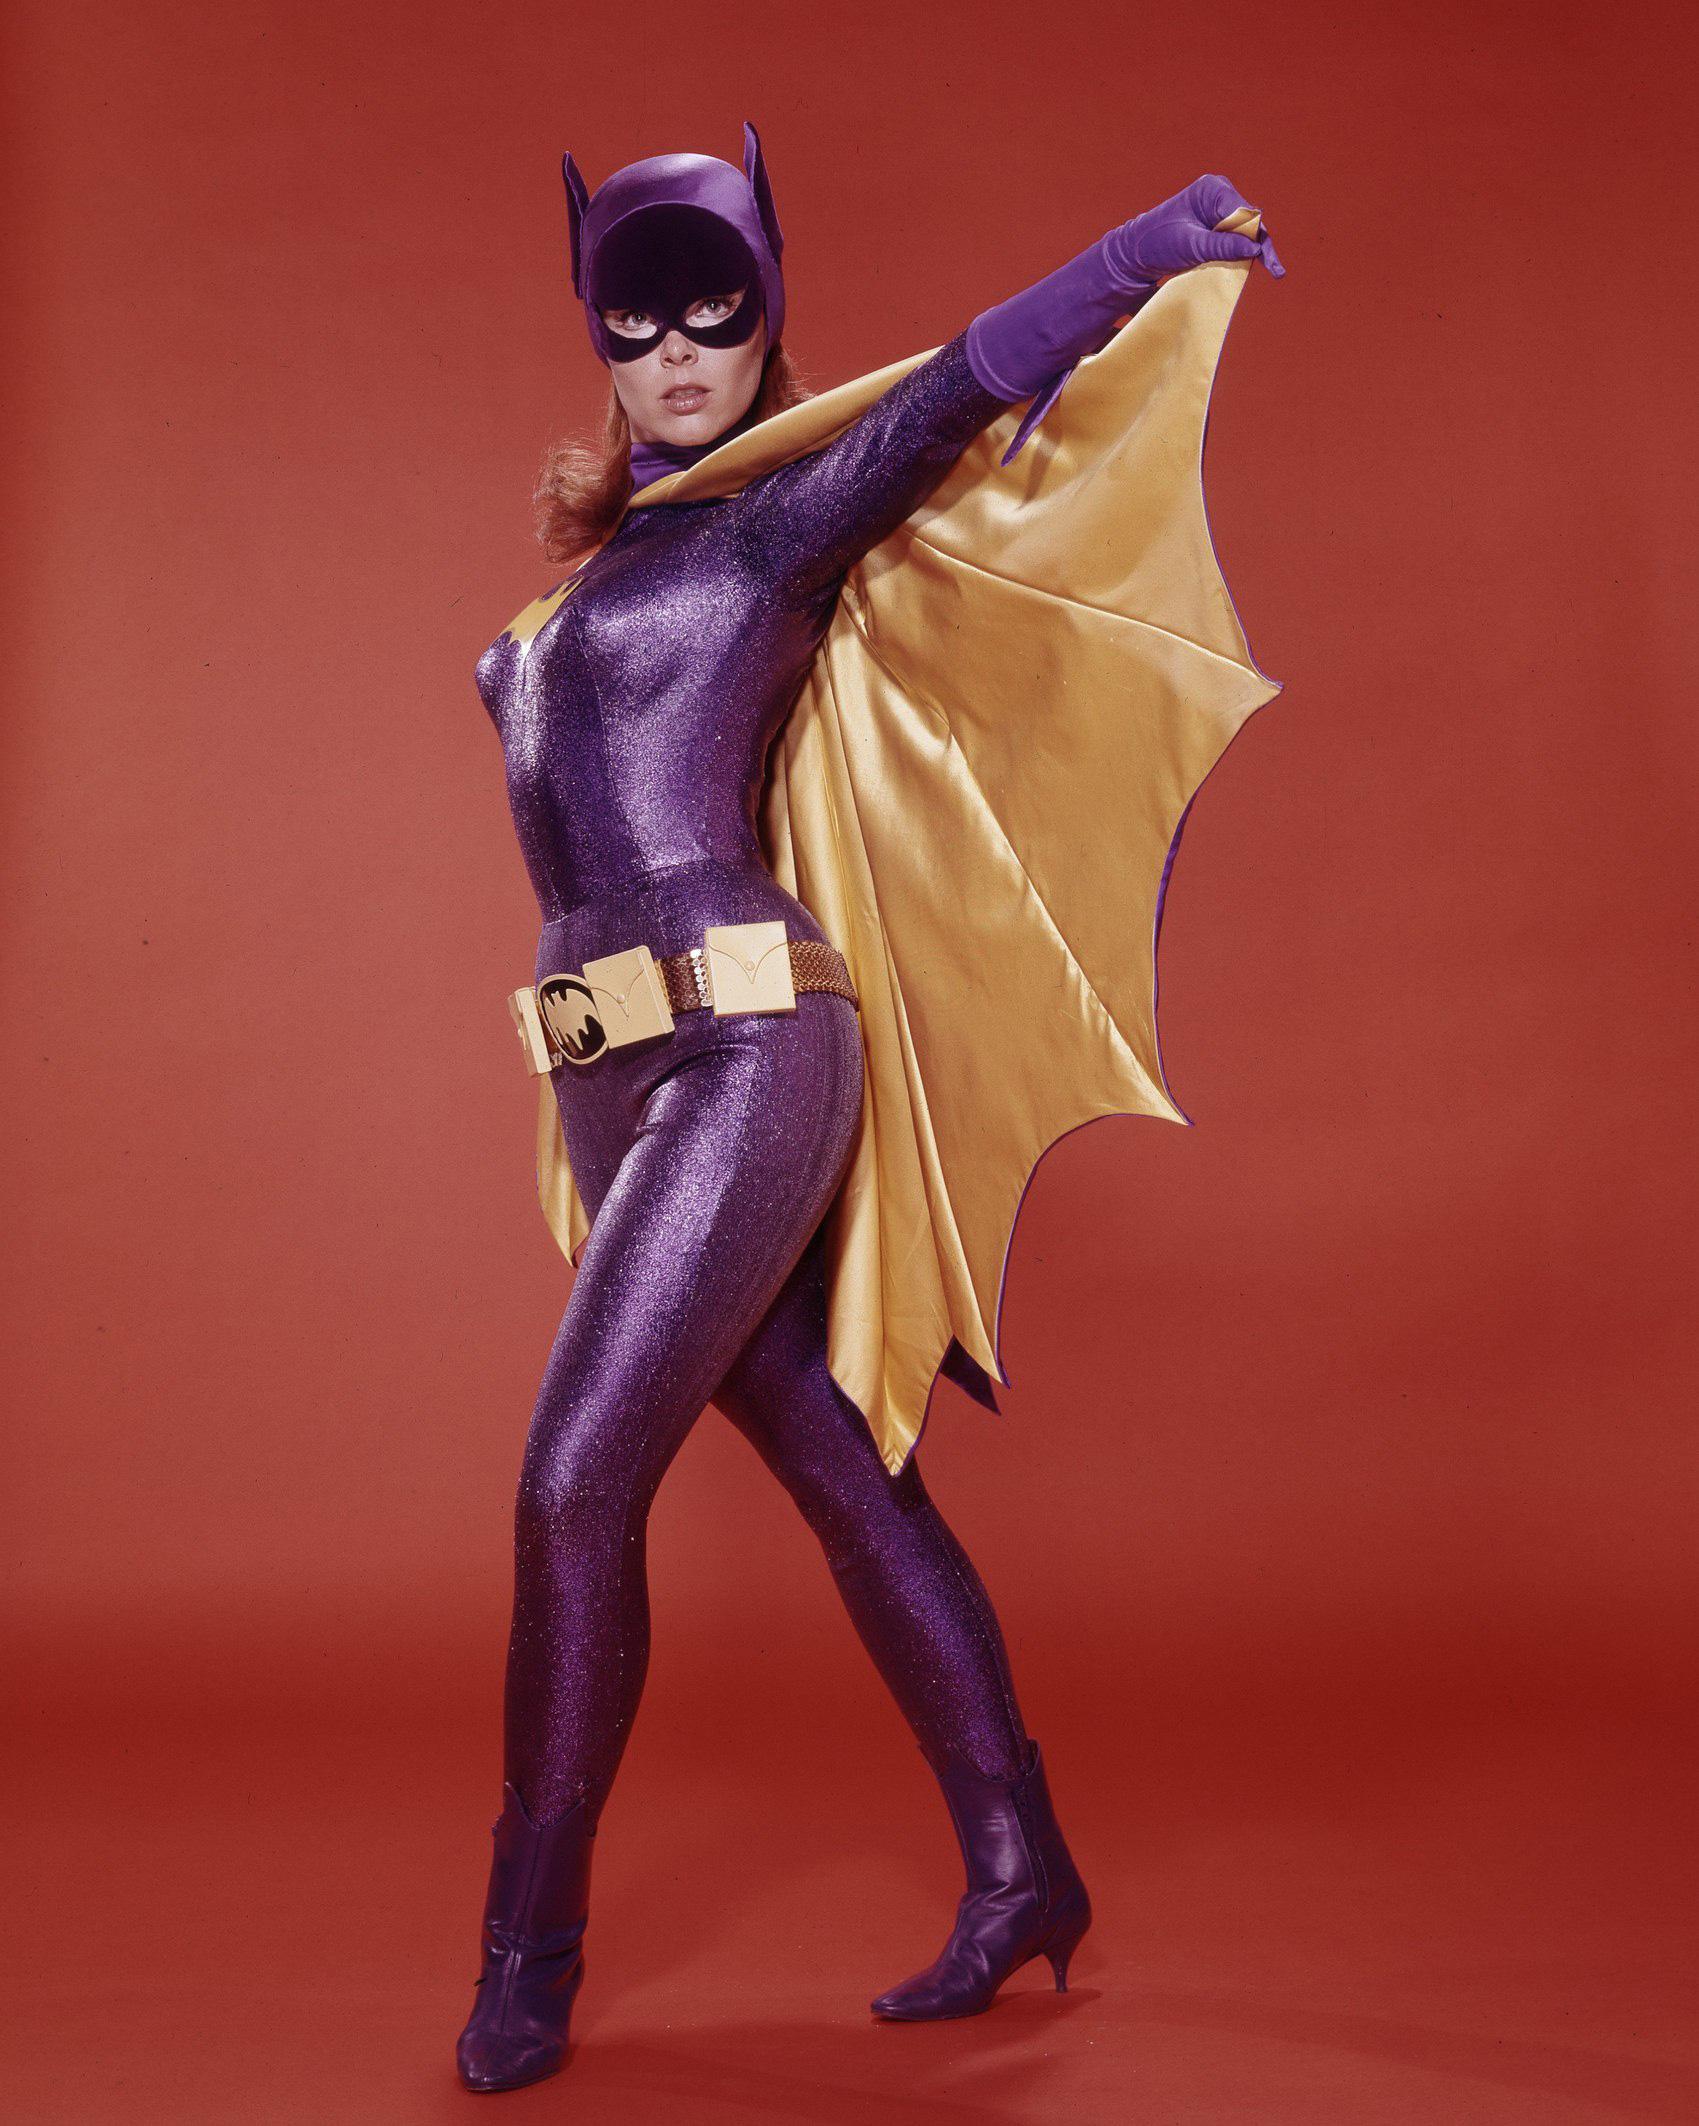 BatgirlTVShoe2